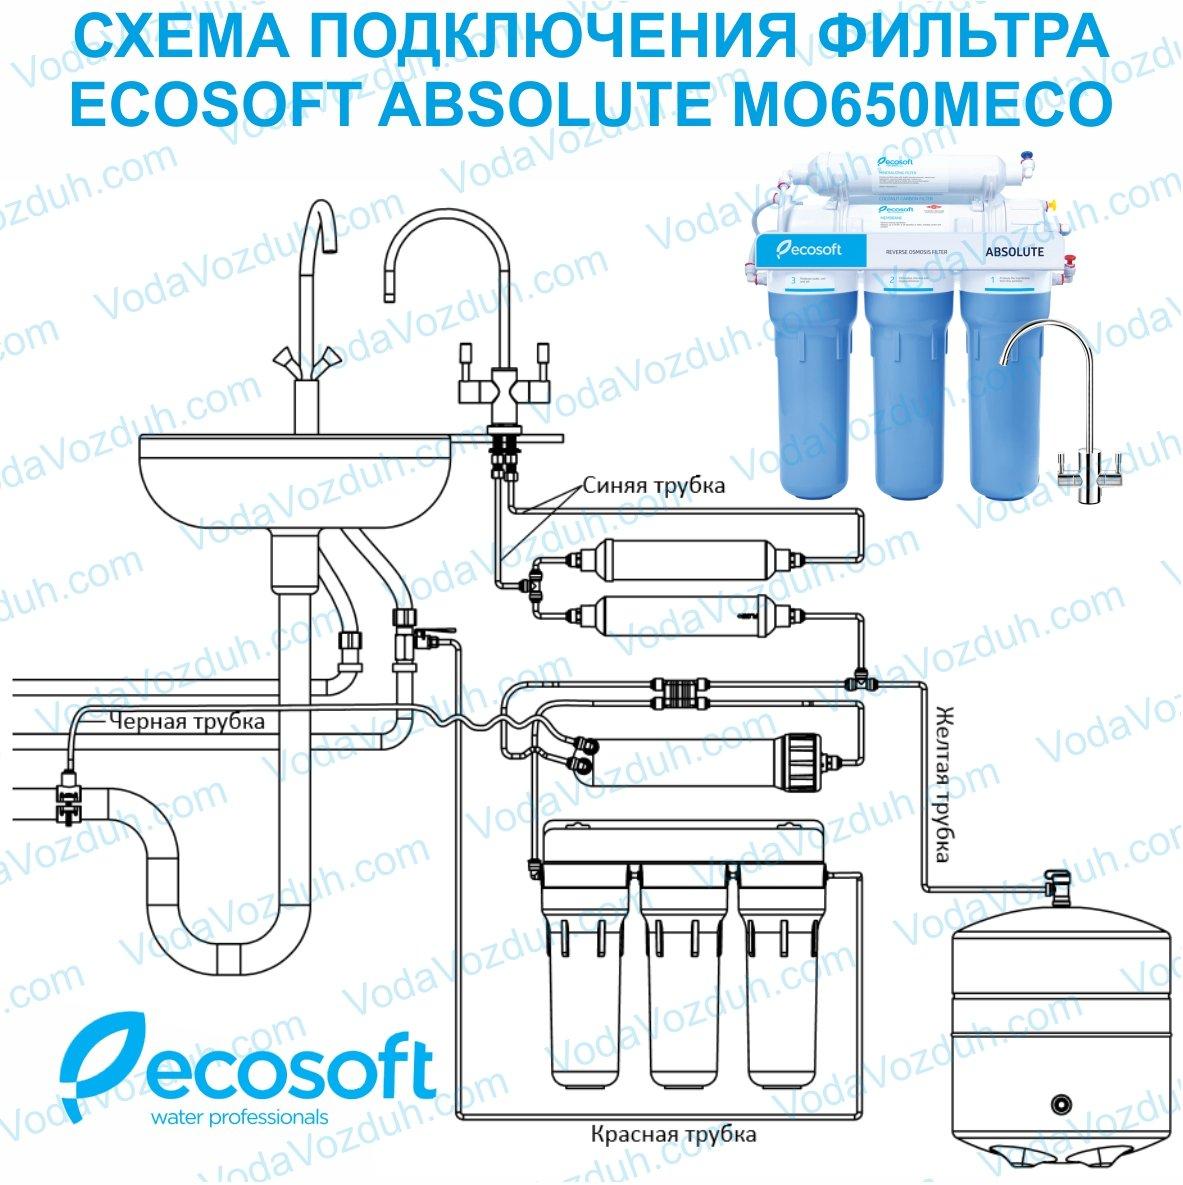 Ecosoft Absolute 6-50M MO650MECO подключение